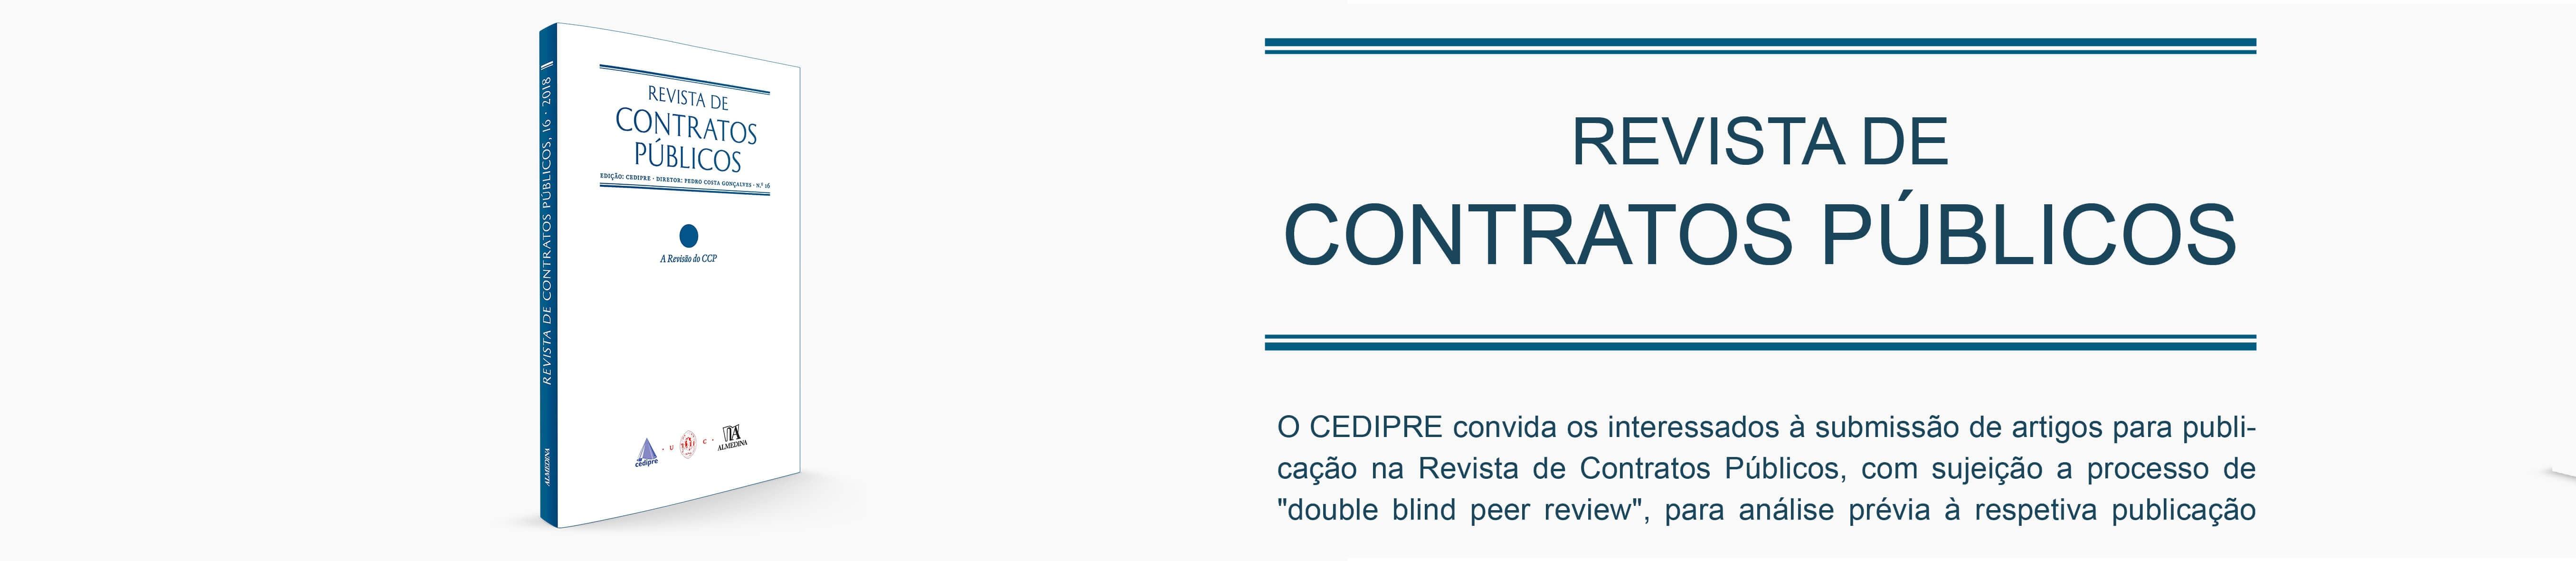 Revista de Contratos Públicos